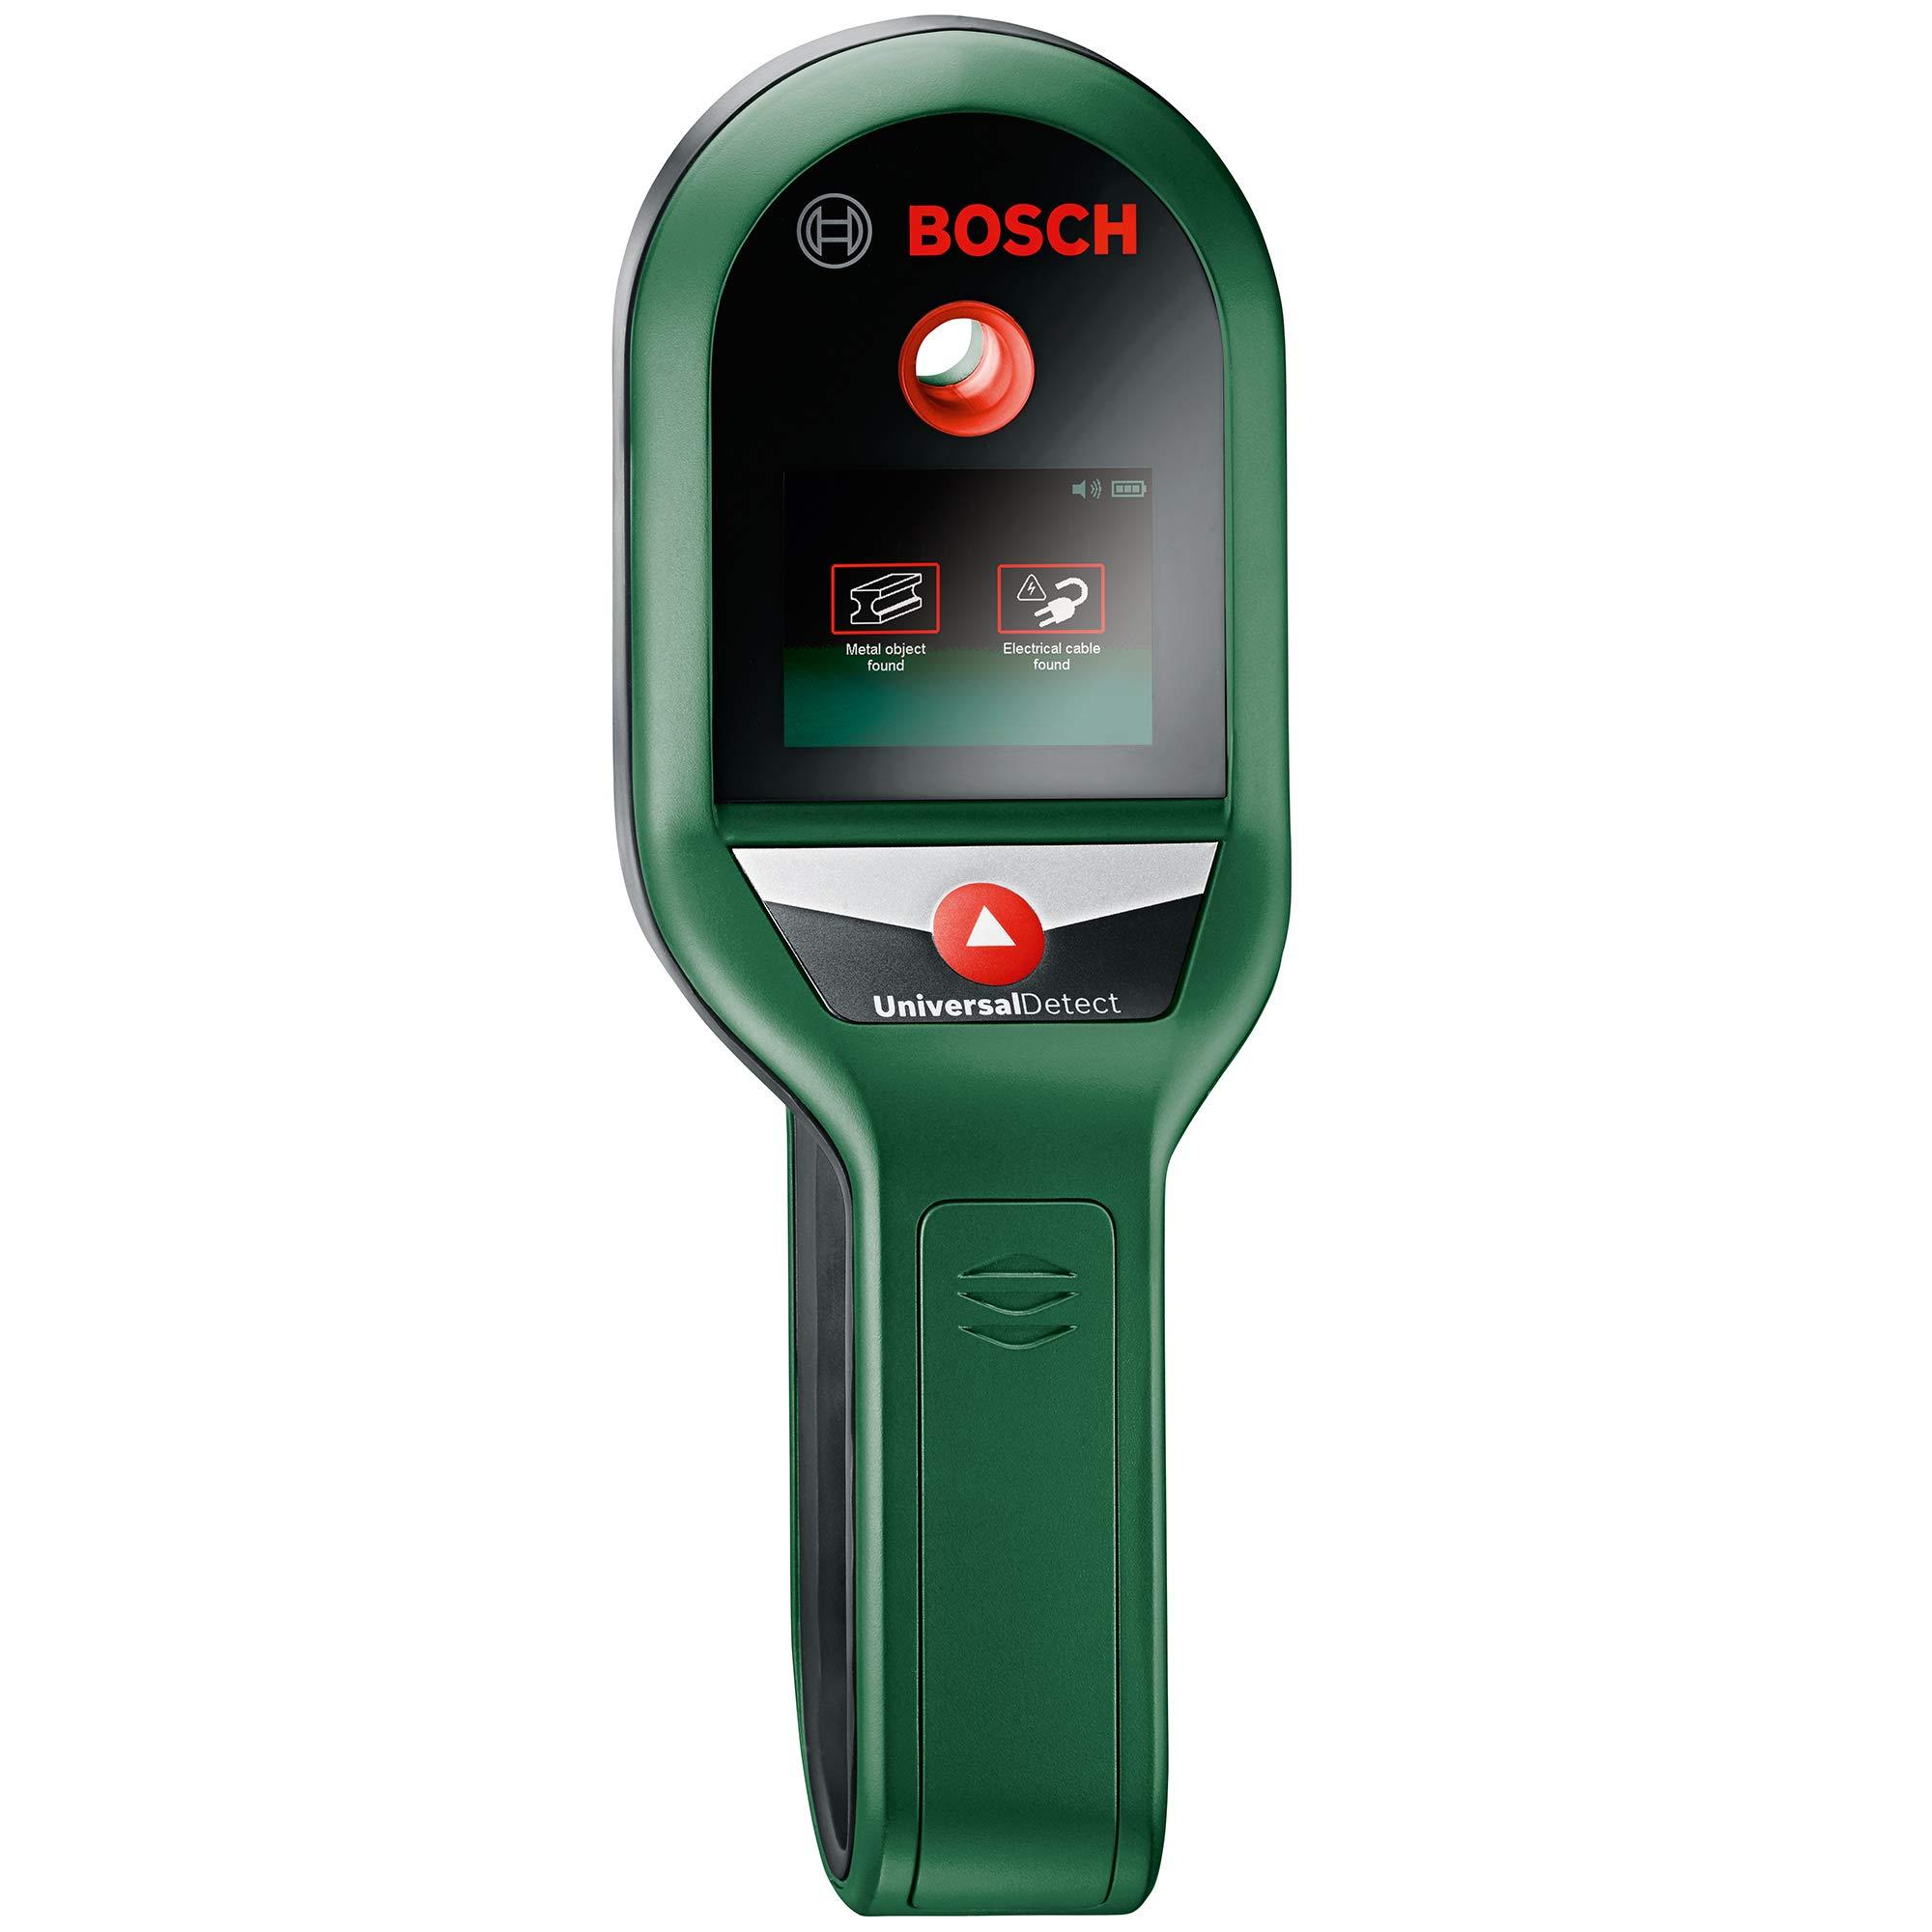 Bosch Home and Garden Ortungsgerät UniversalDetect 0603681300 Ortungstiefe (MAX.) 100mm apropiado f